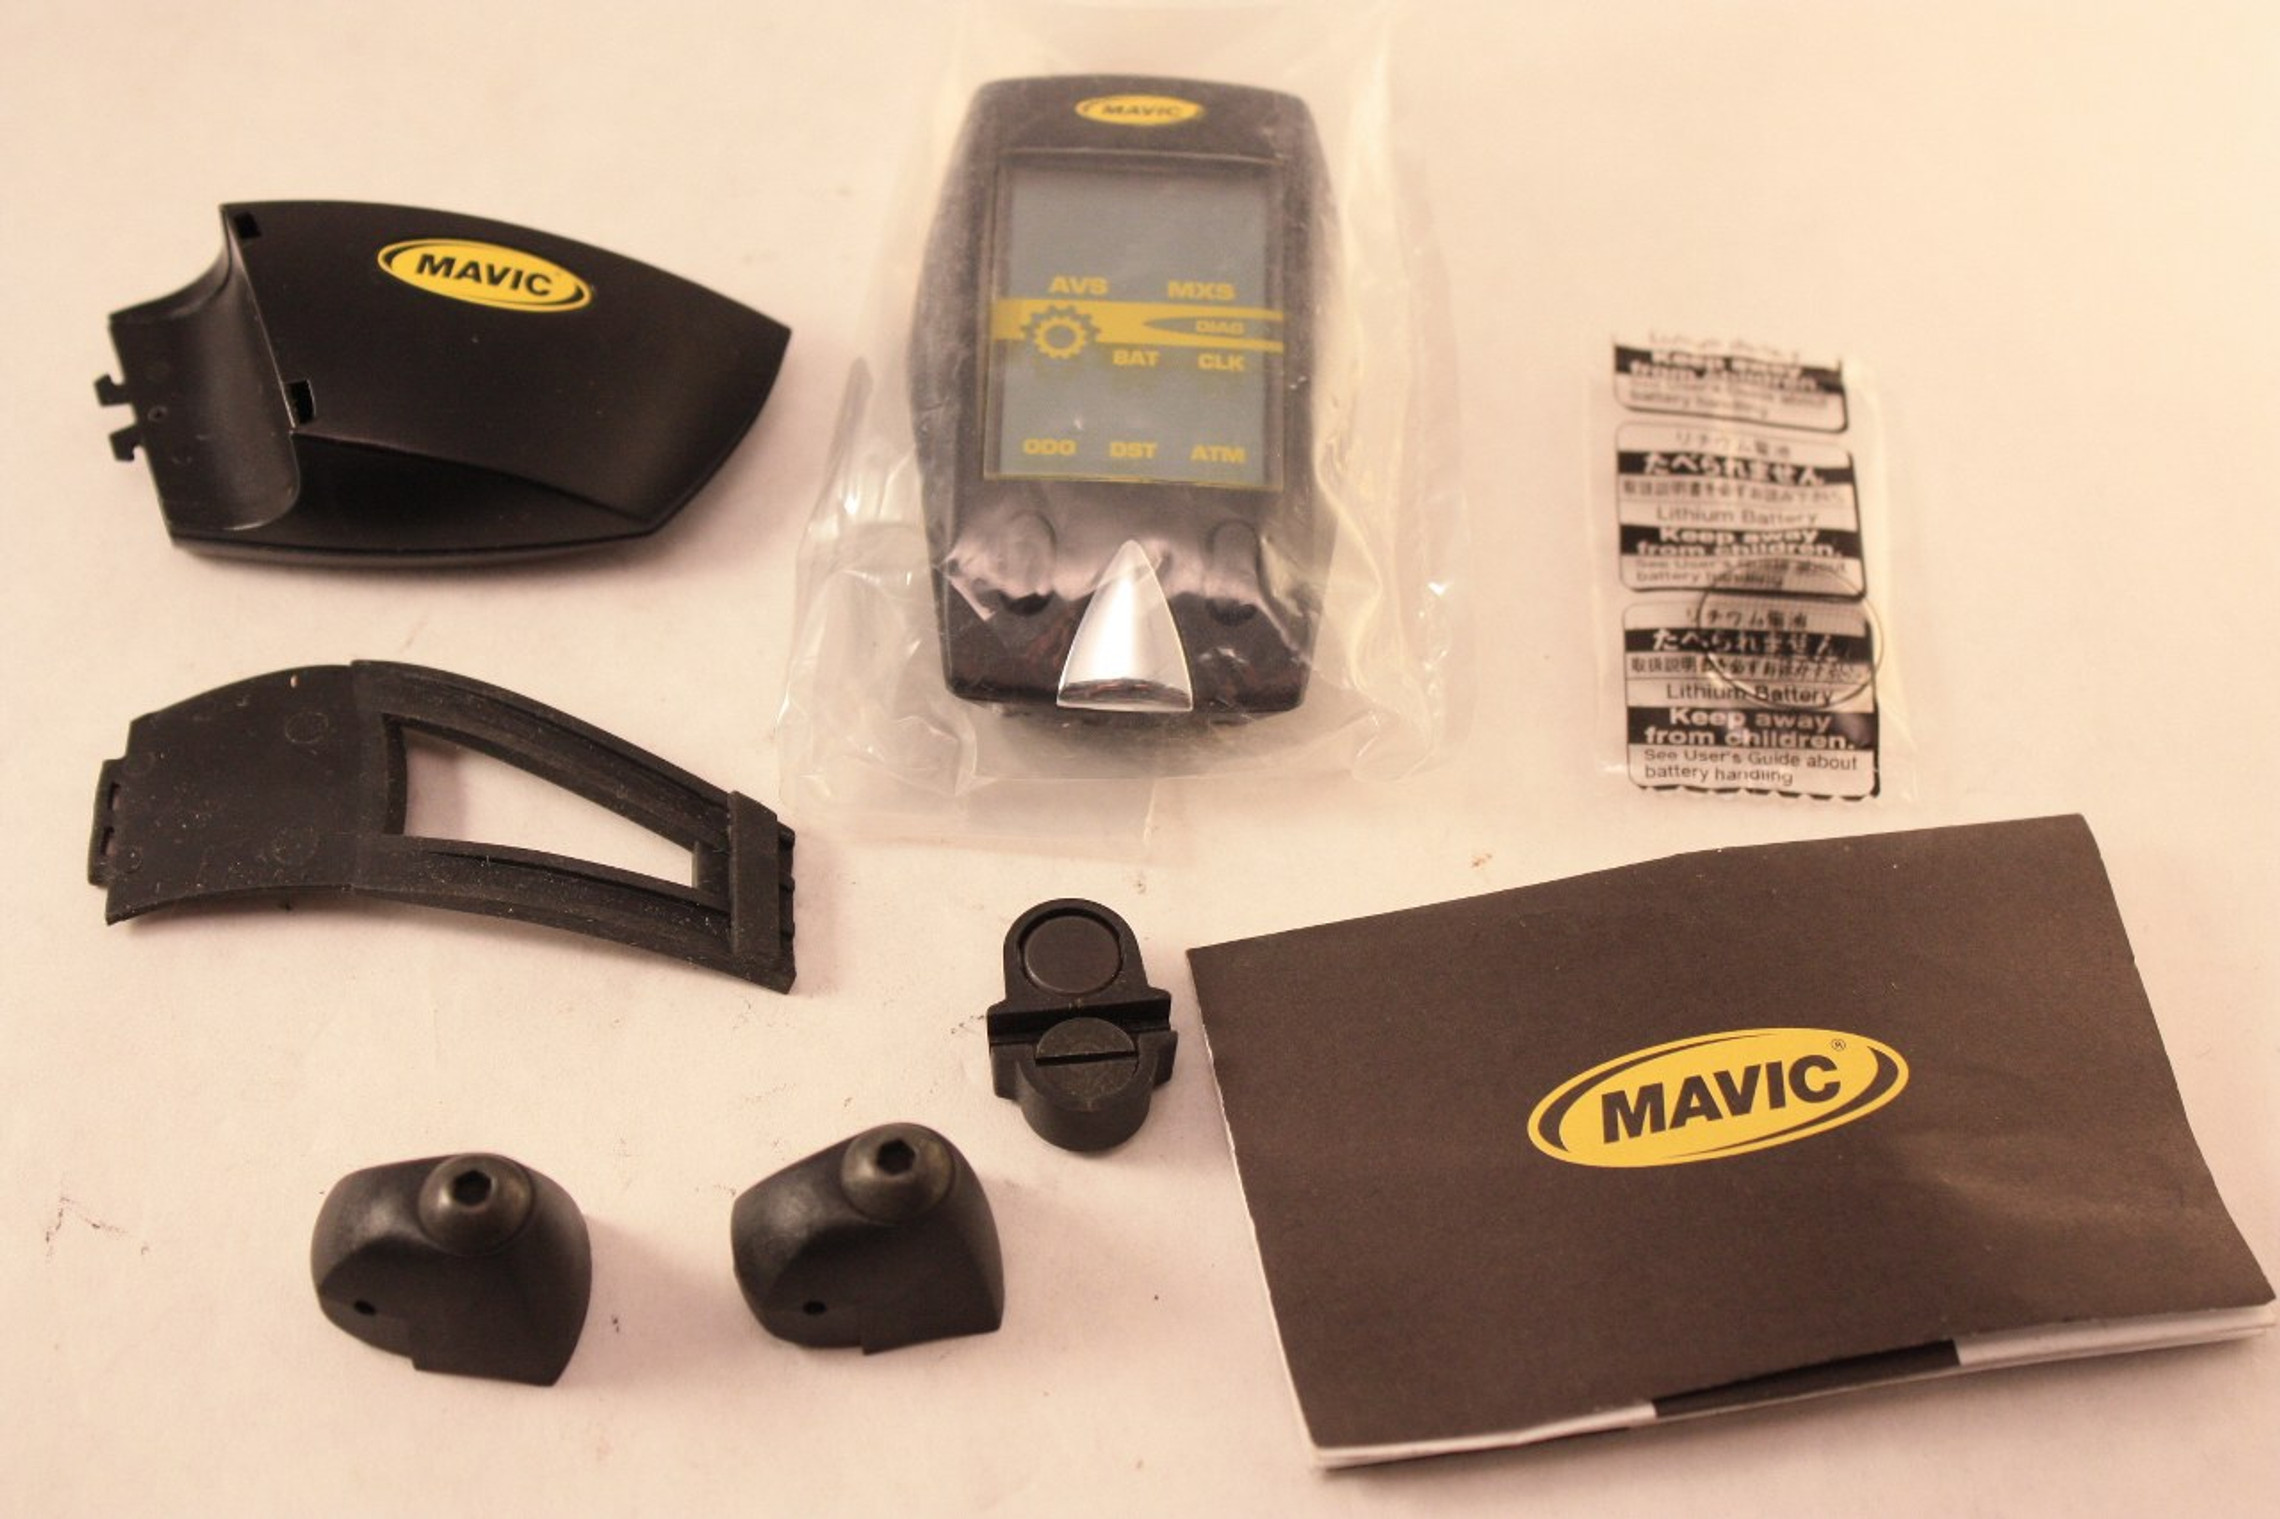 NIB/NOS Mavic Mektronic Electronic Shifting Drivetrain